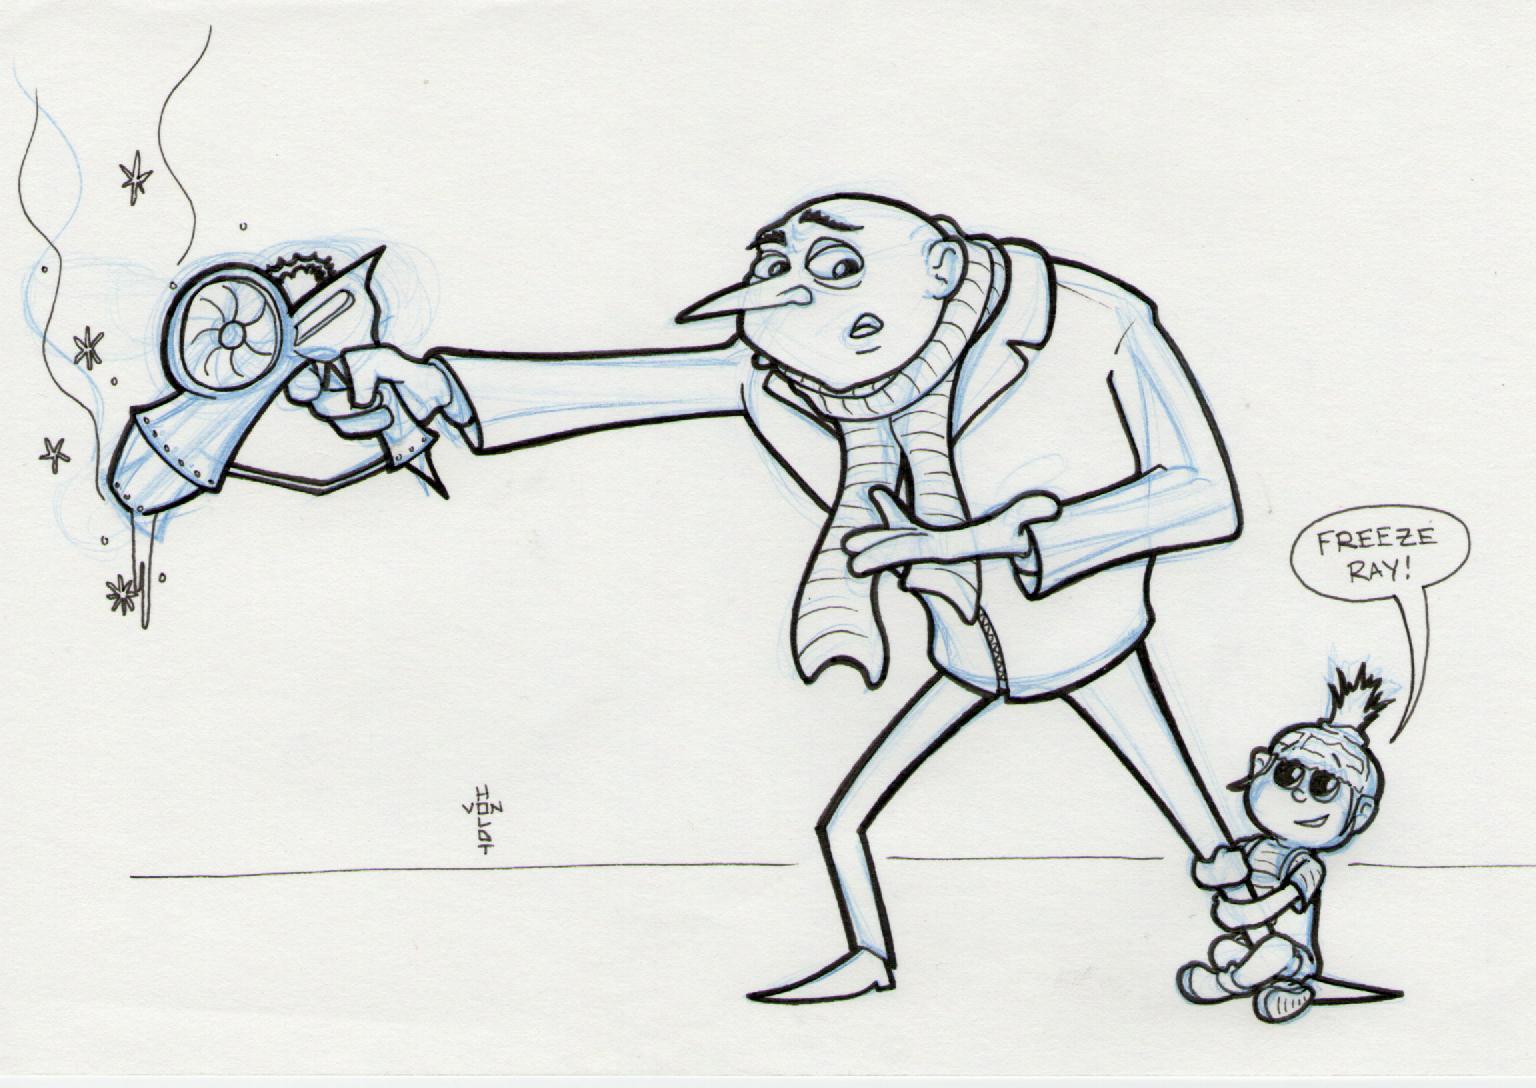 Drawn rabbid doodle A me despicable Me Day